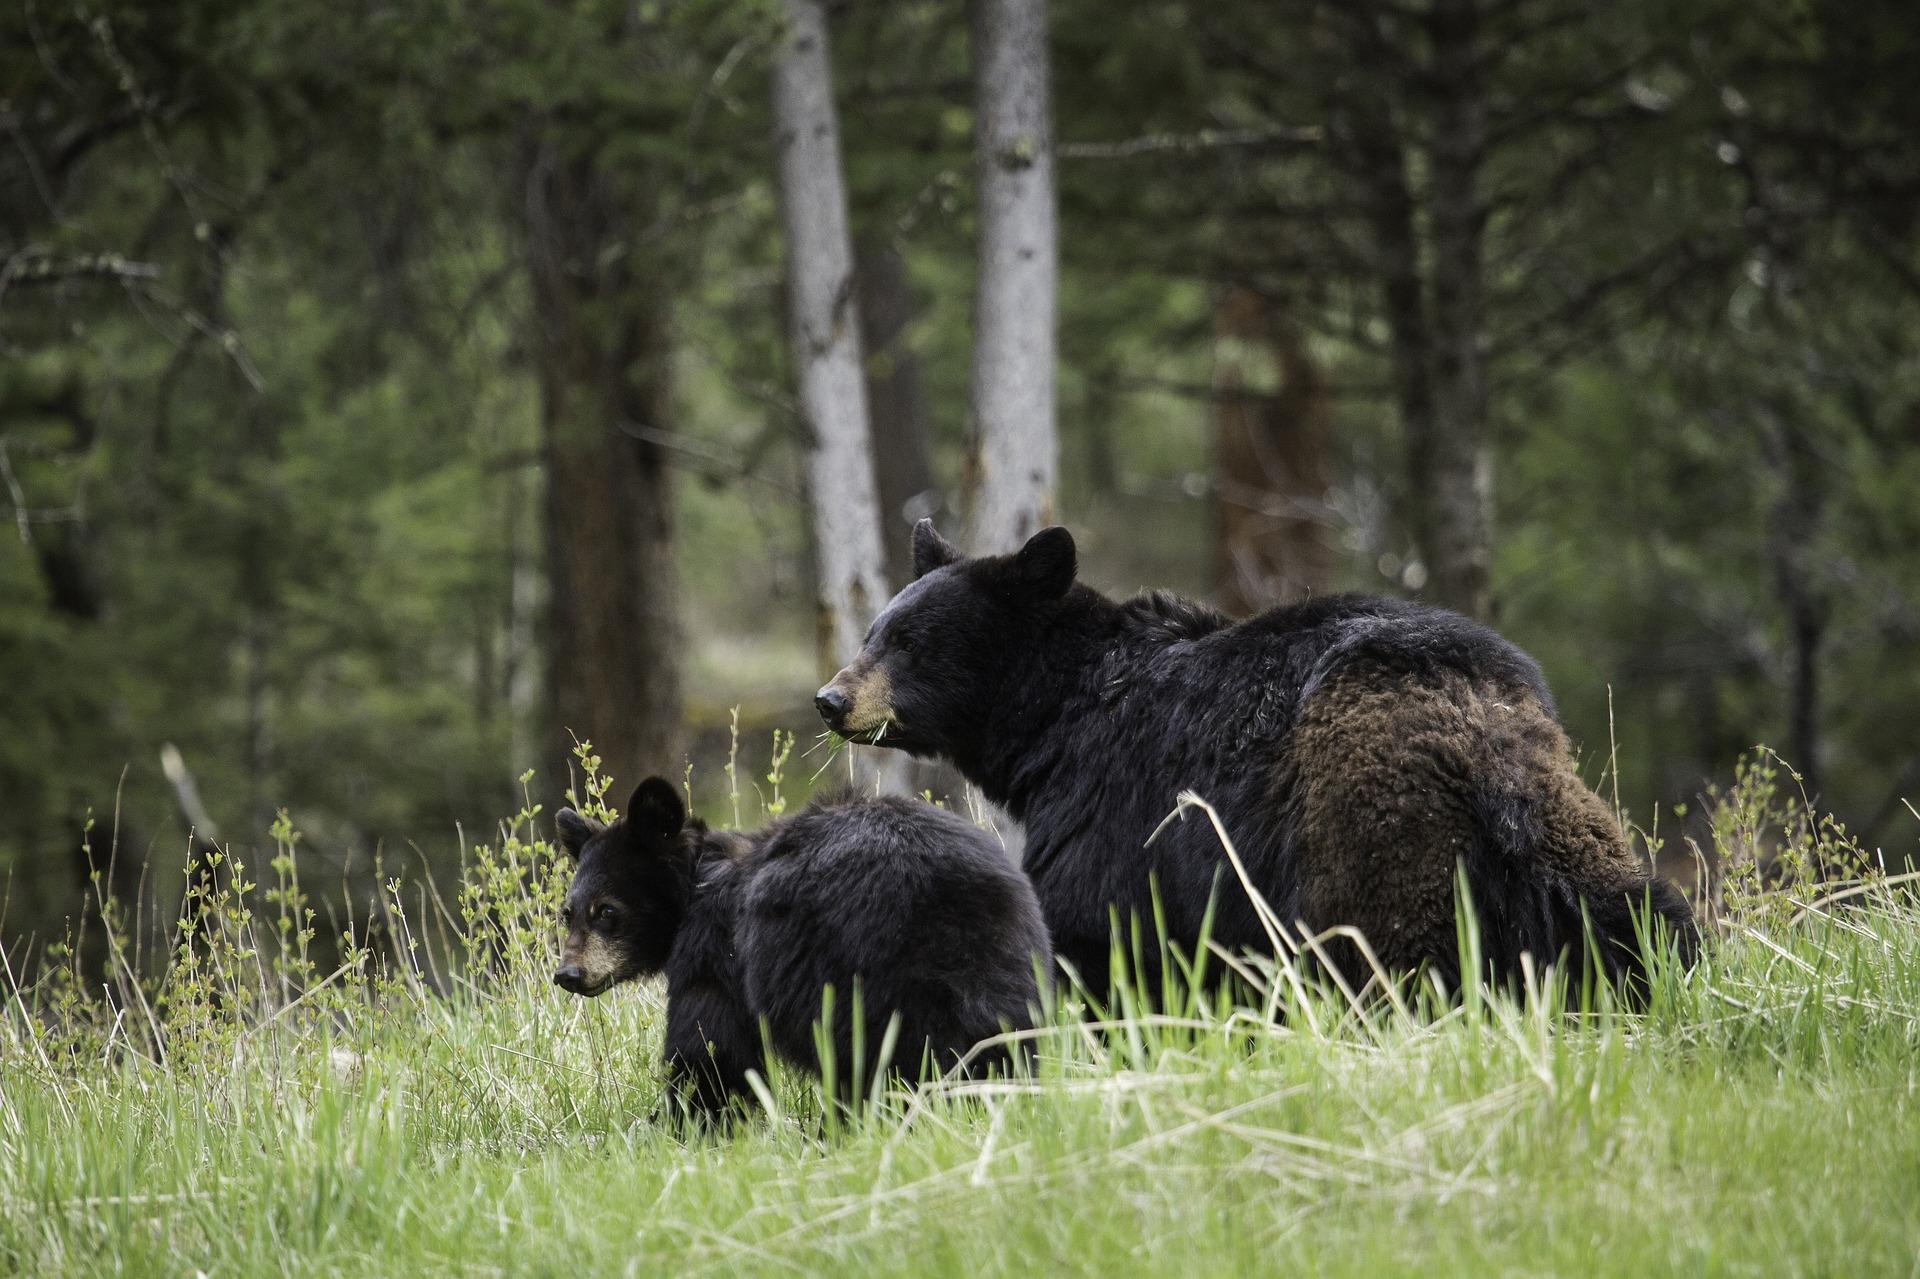 black-bears-1972307_1920.jpg